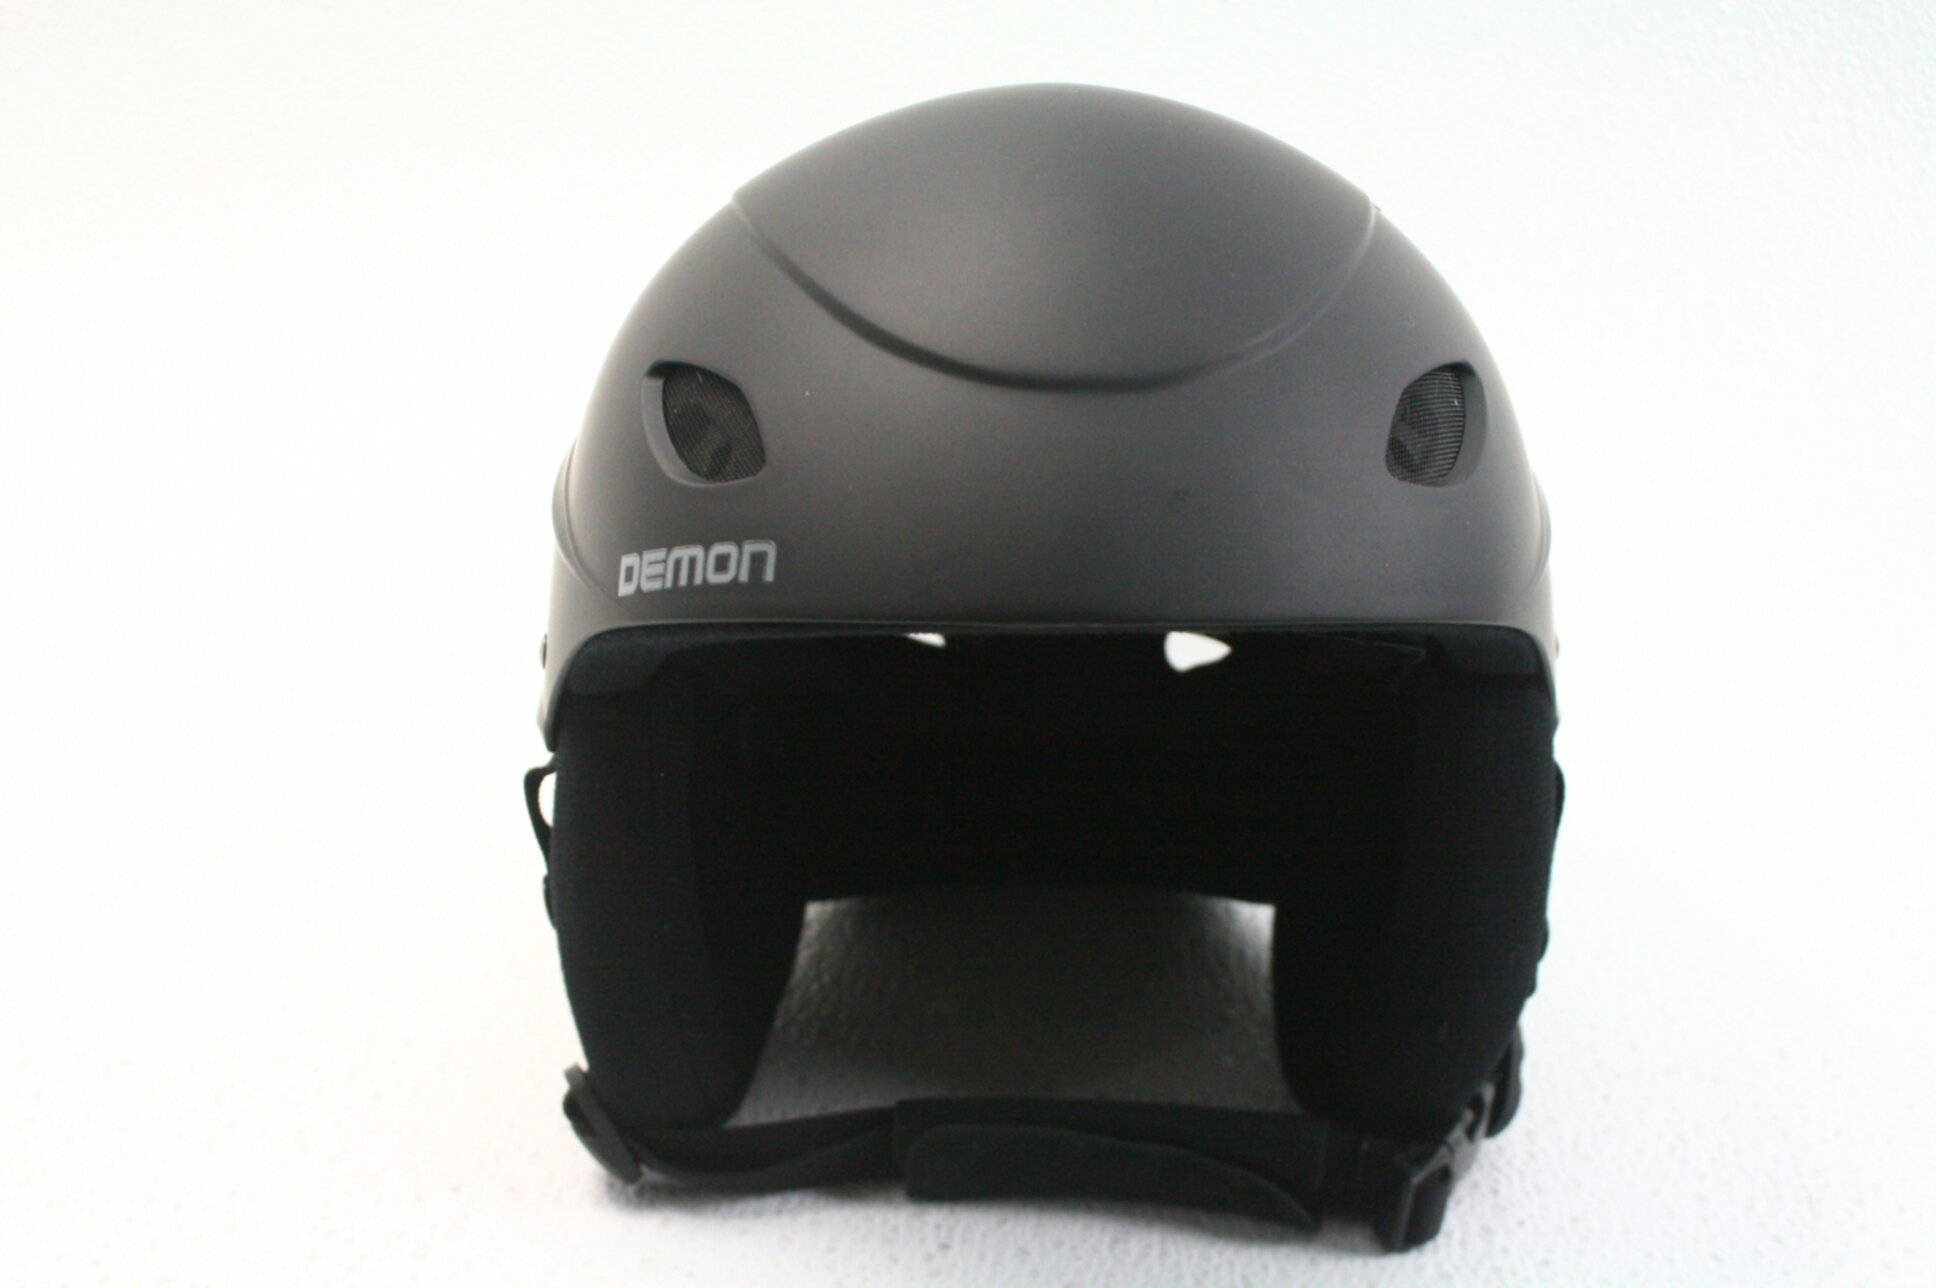 Demon United ds6504a Phantom Helmet w Brainteaser Audio ...